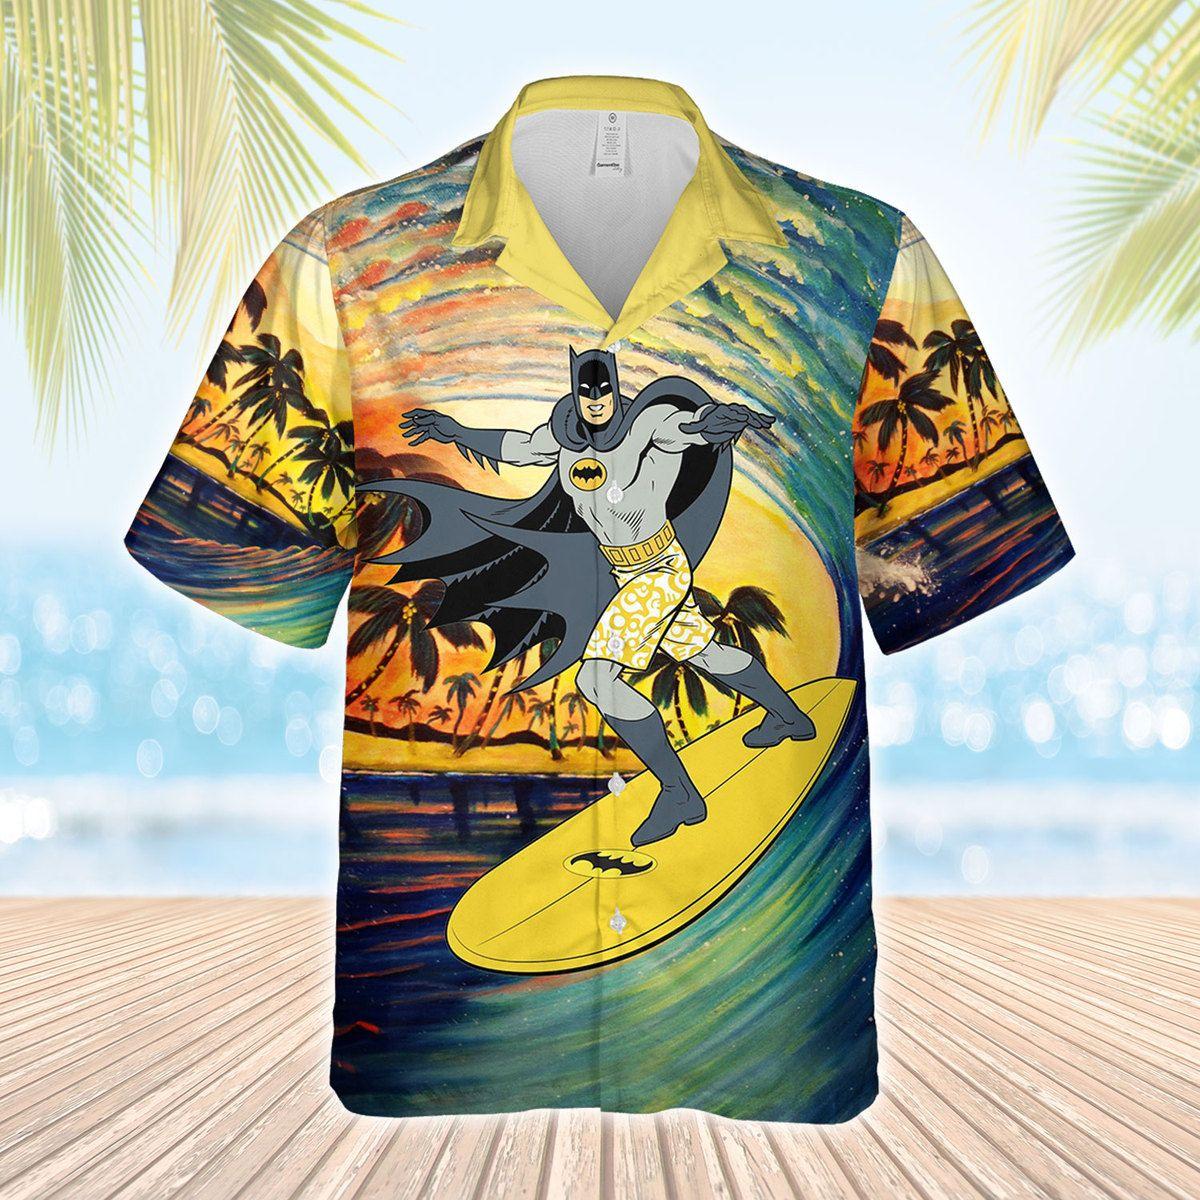 Batman Surfing Hawaiian Shirt and Beach Shorts